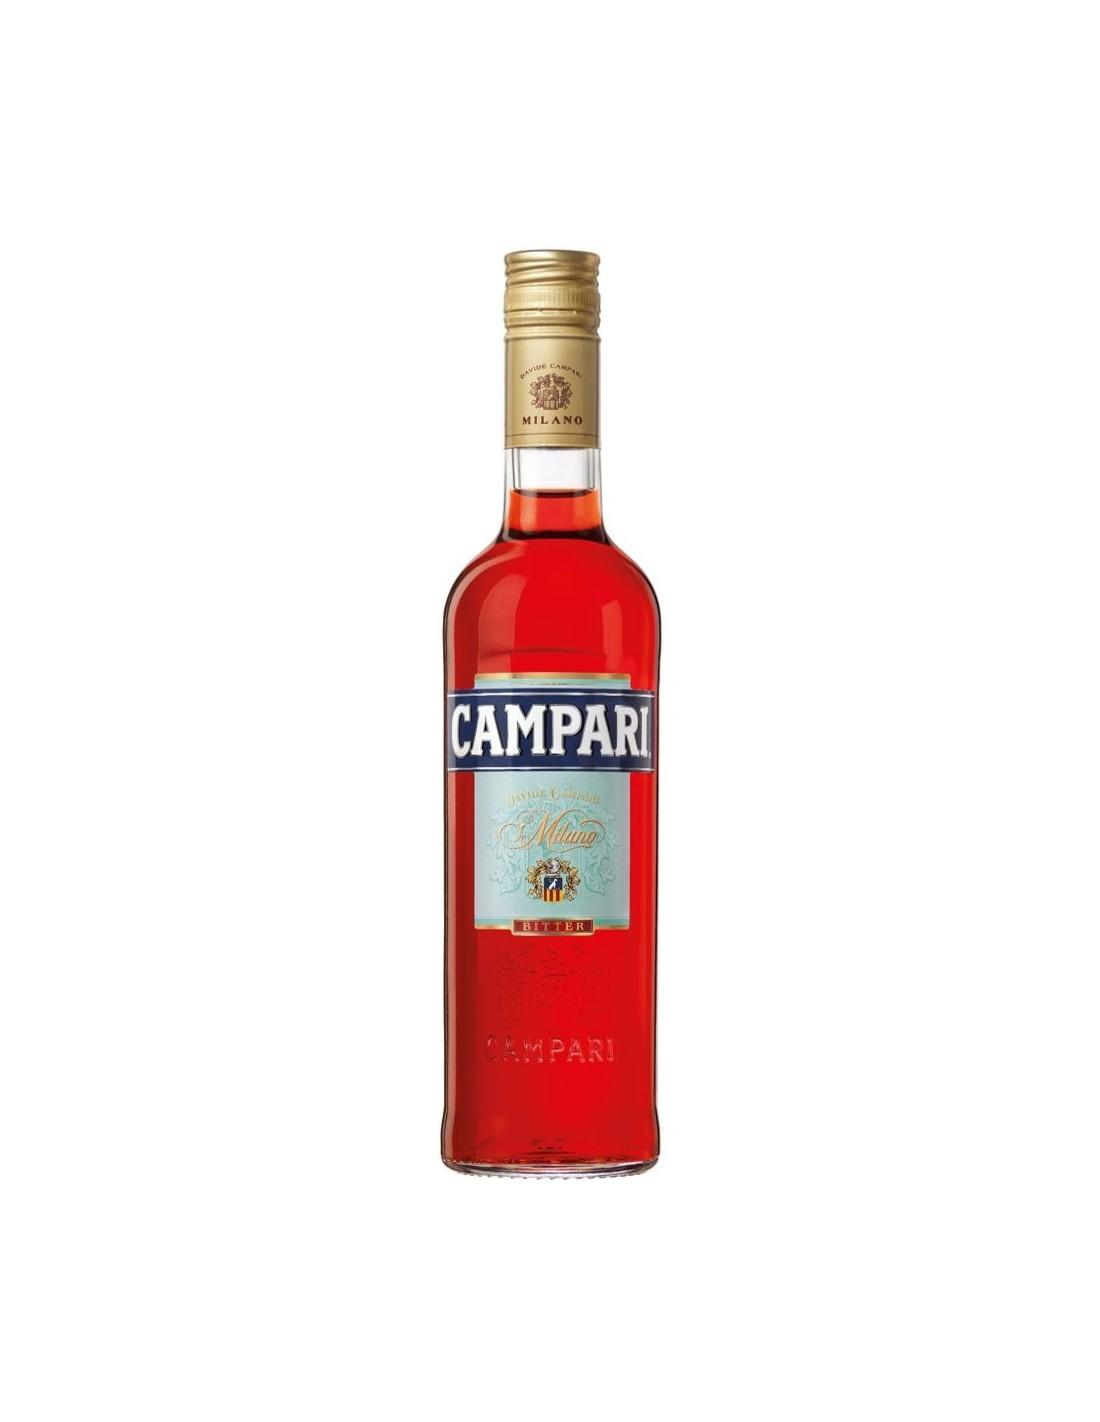 Vermut Campari, 25% alc., 0.7L, Italia